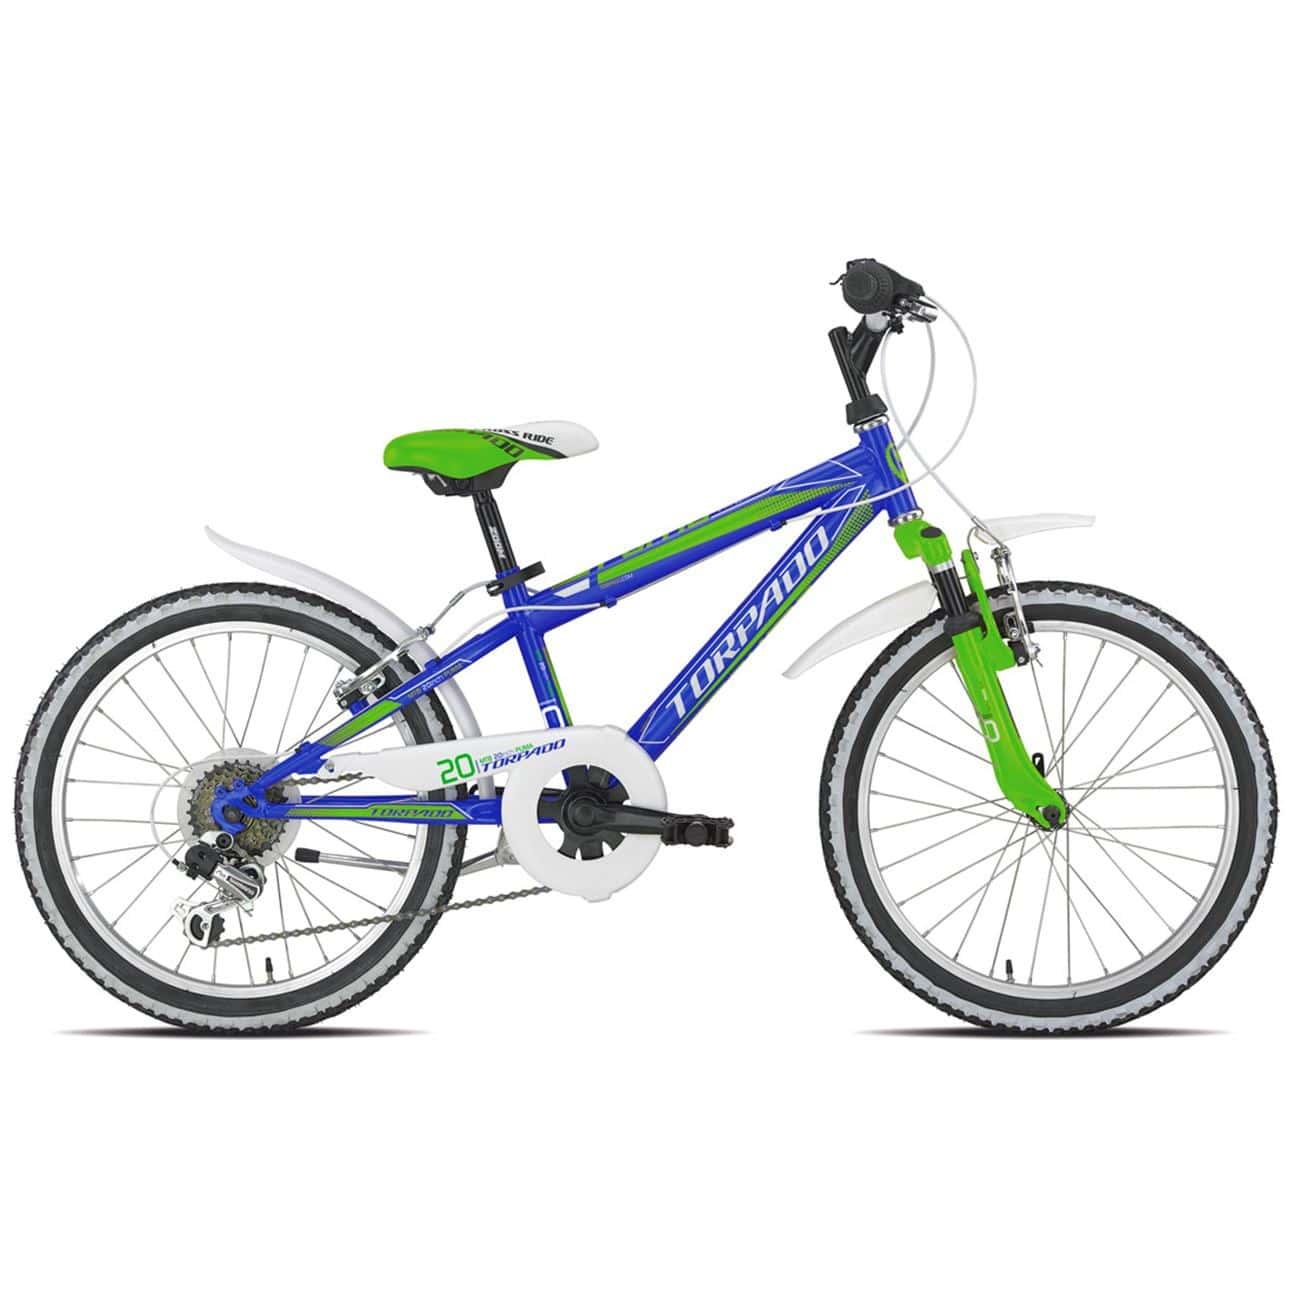 "Torpado Παιδικό Ποδήλατο Puma 20"""